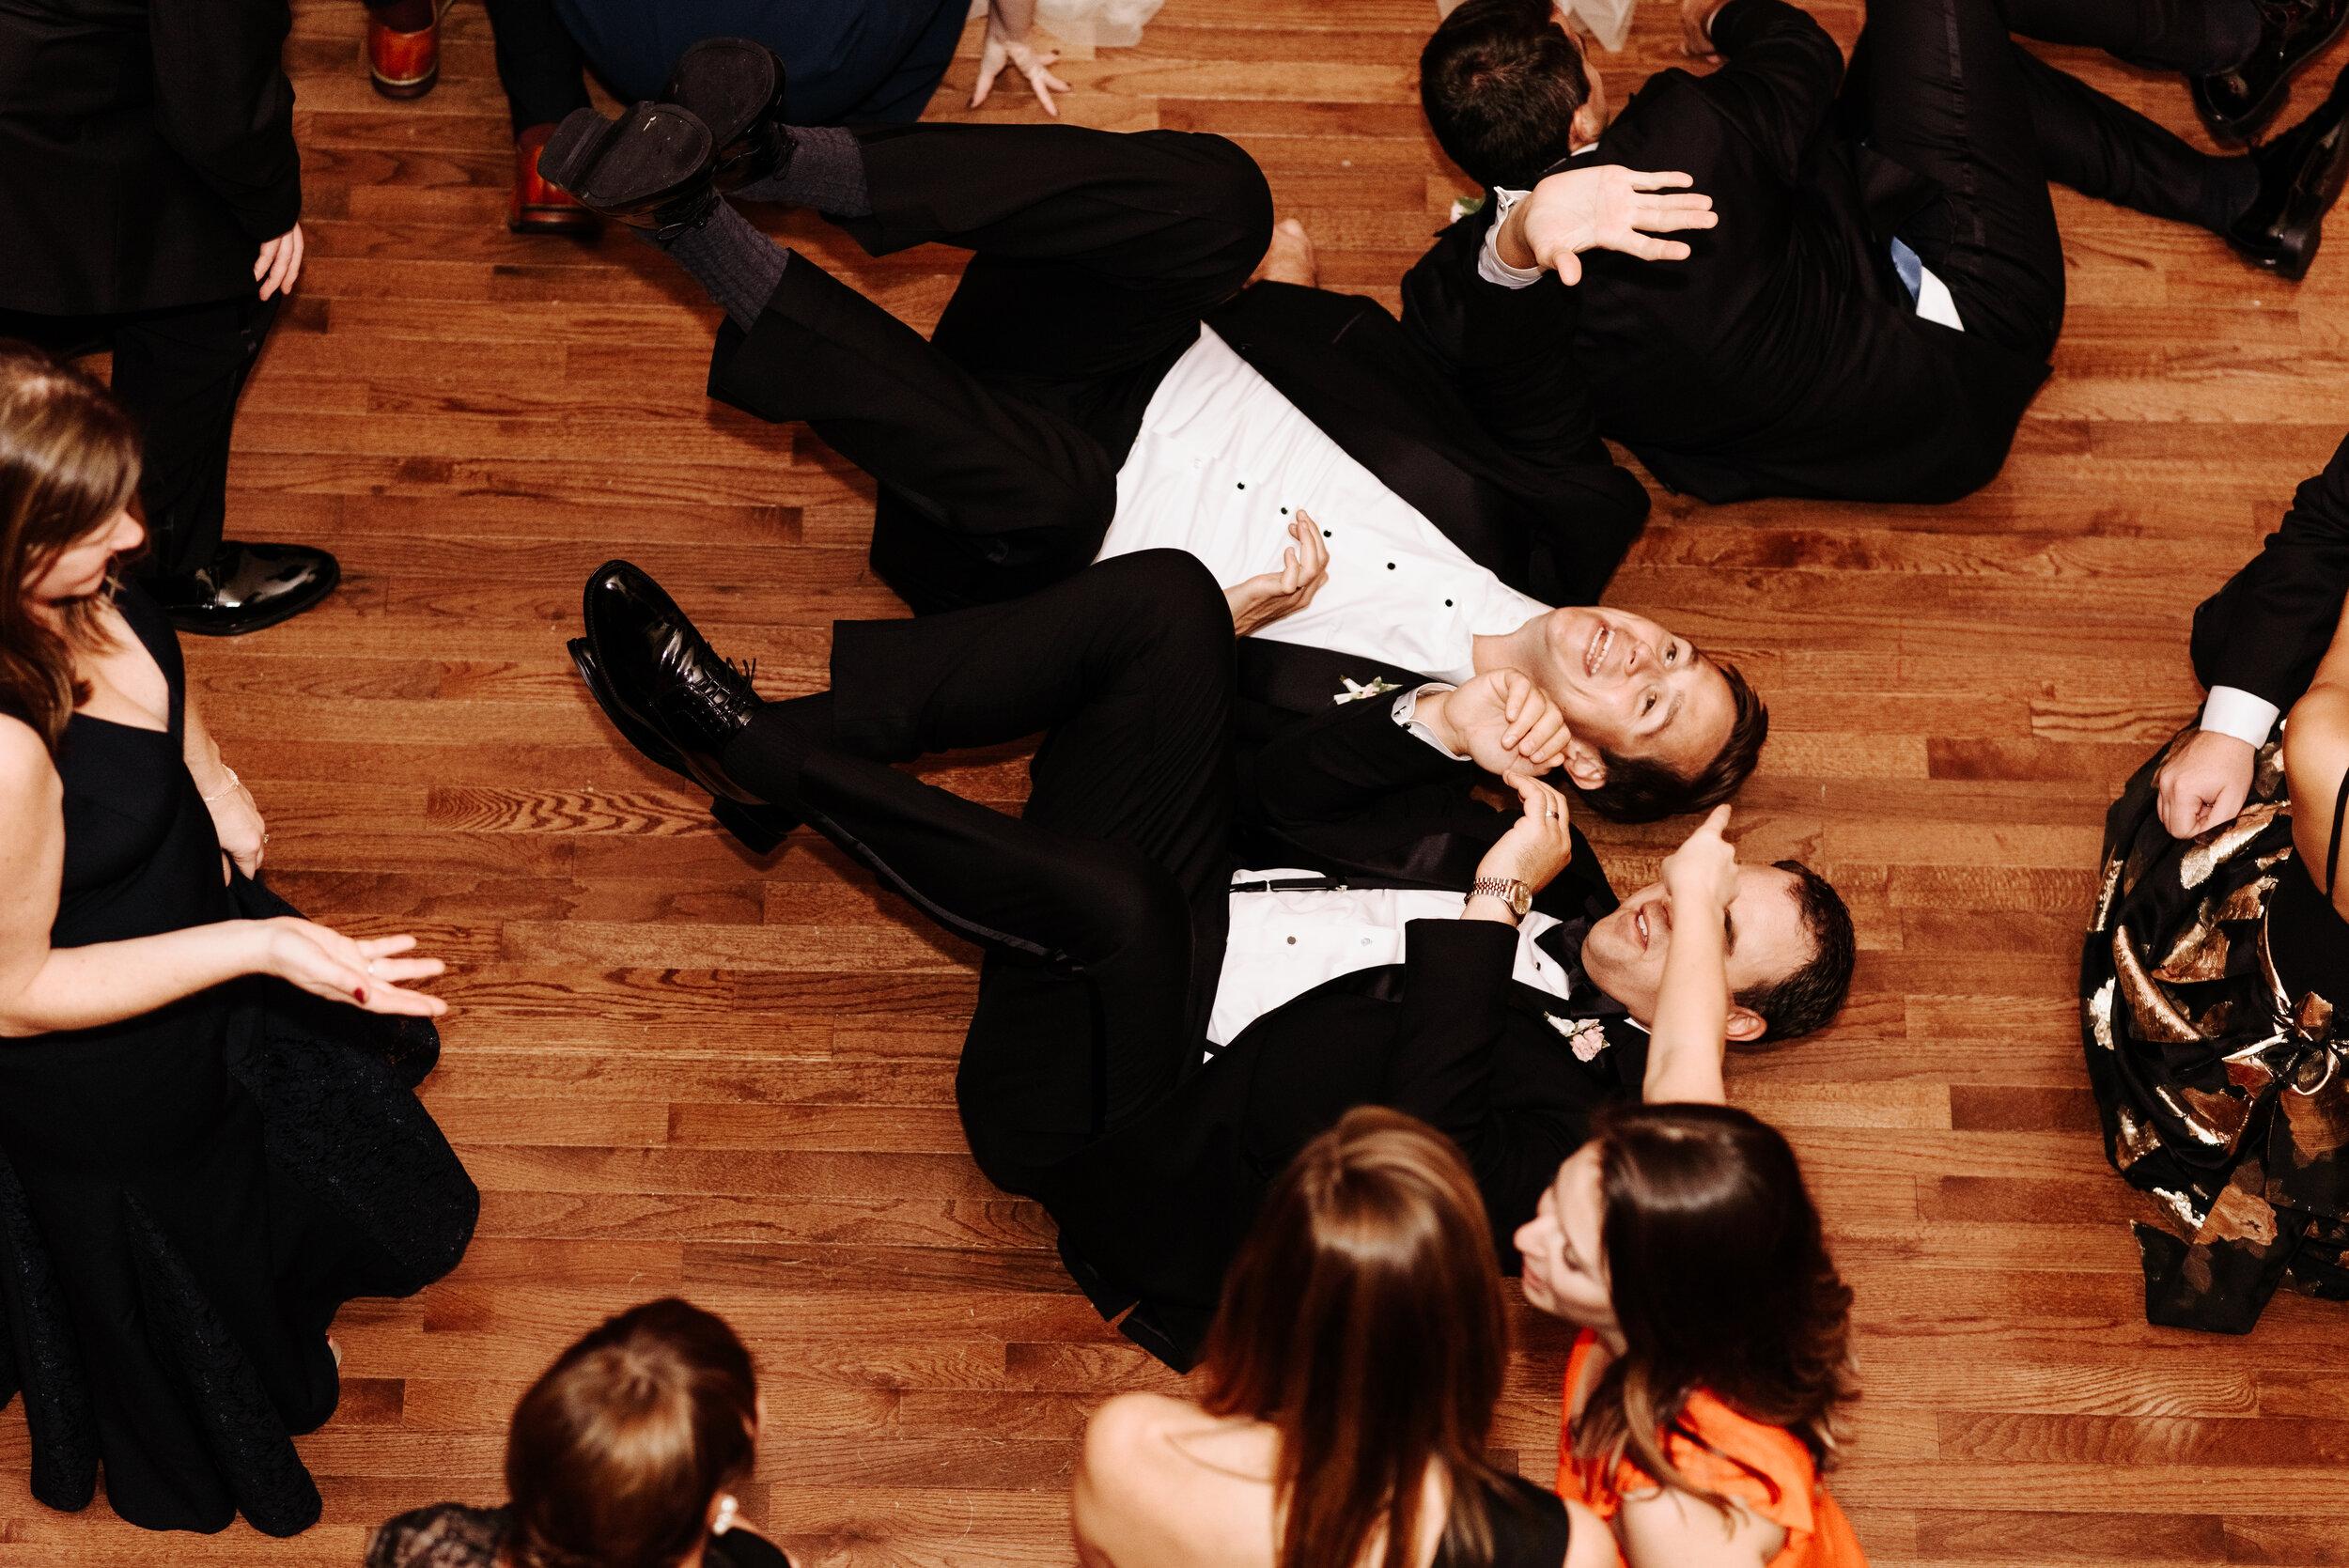 Cassie-Mrunal-Wedding-Quirk-Hotel-John-Marshall-Ballrooms-Richmond-Virginia-Photography-by-V-115.jpg